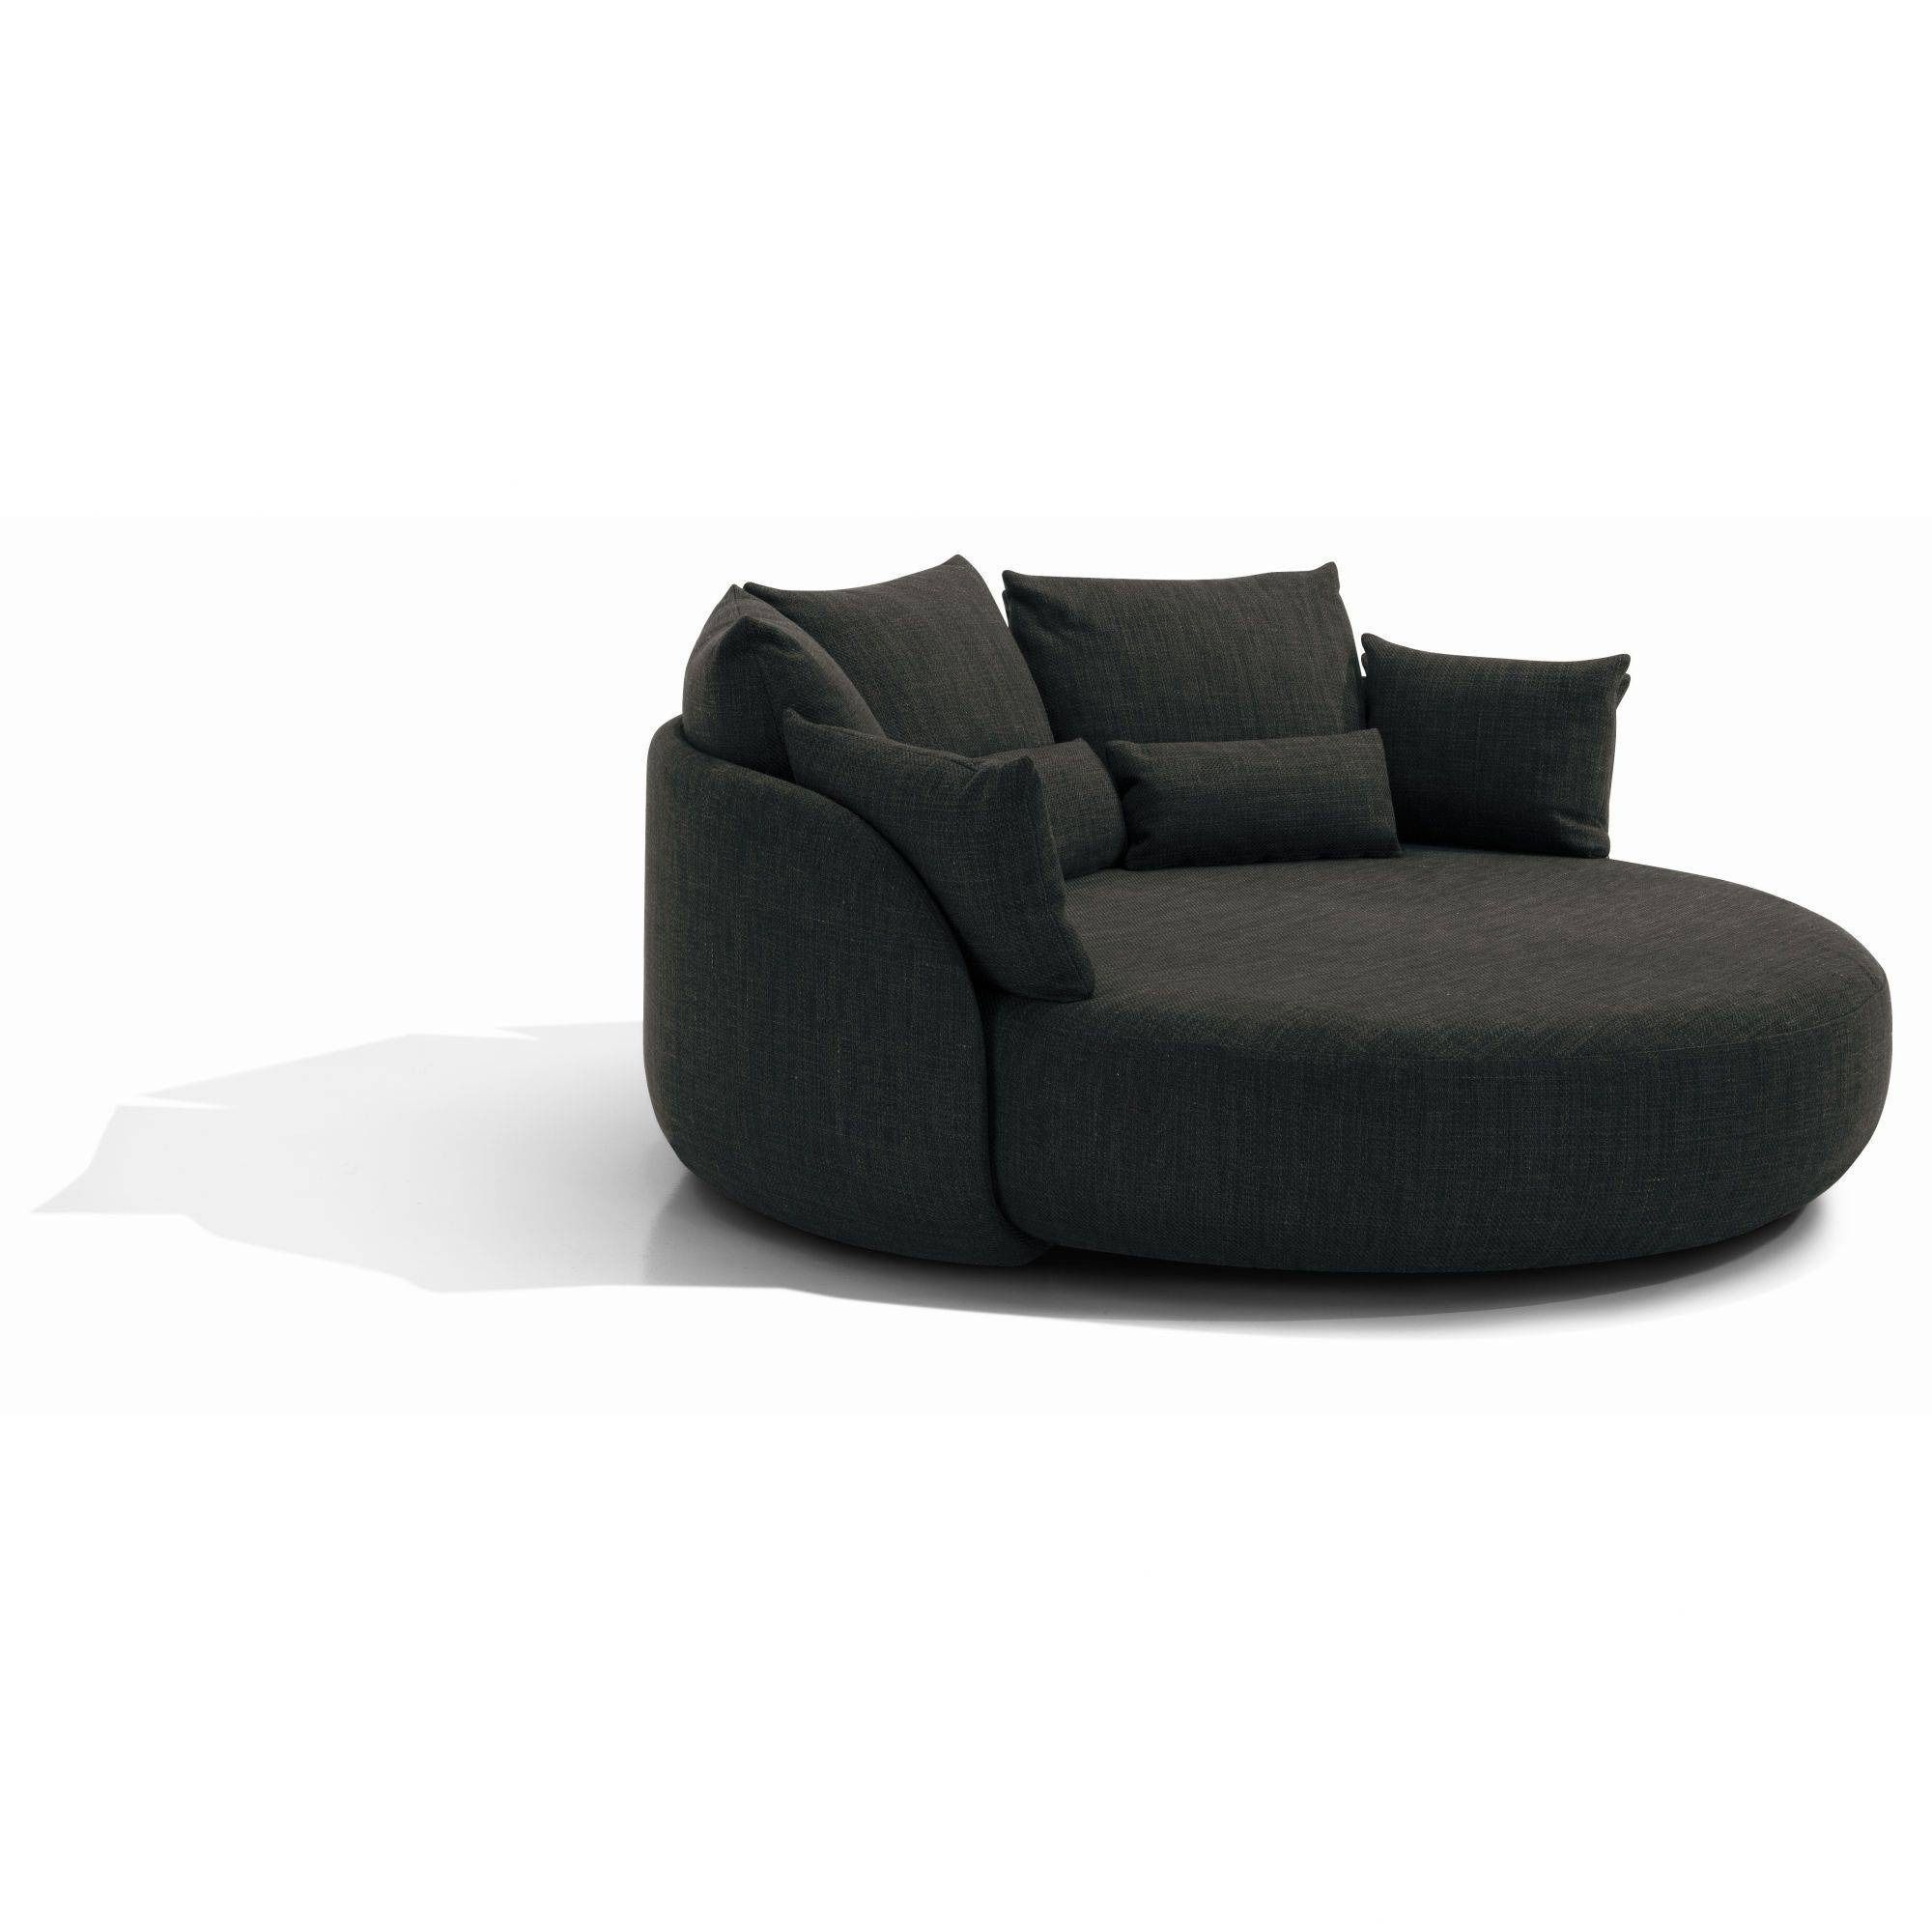 15 Inspiring White Couch  Round sofa, Circle sofa, Round sofa chair